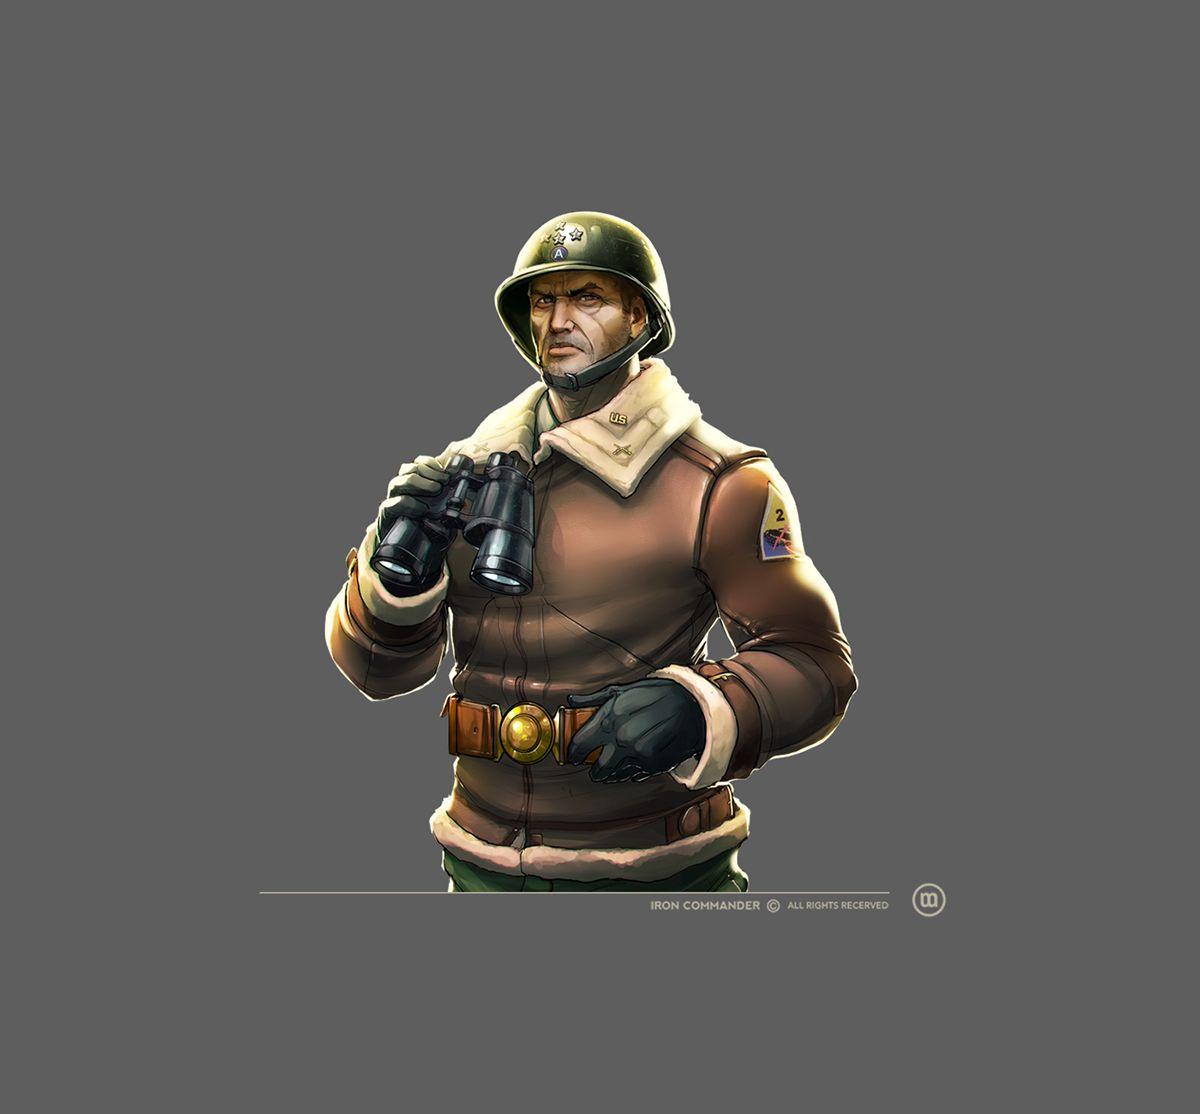 IRON COMMANDER - character design on Behance